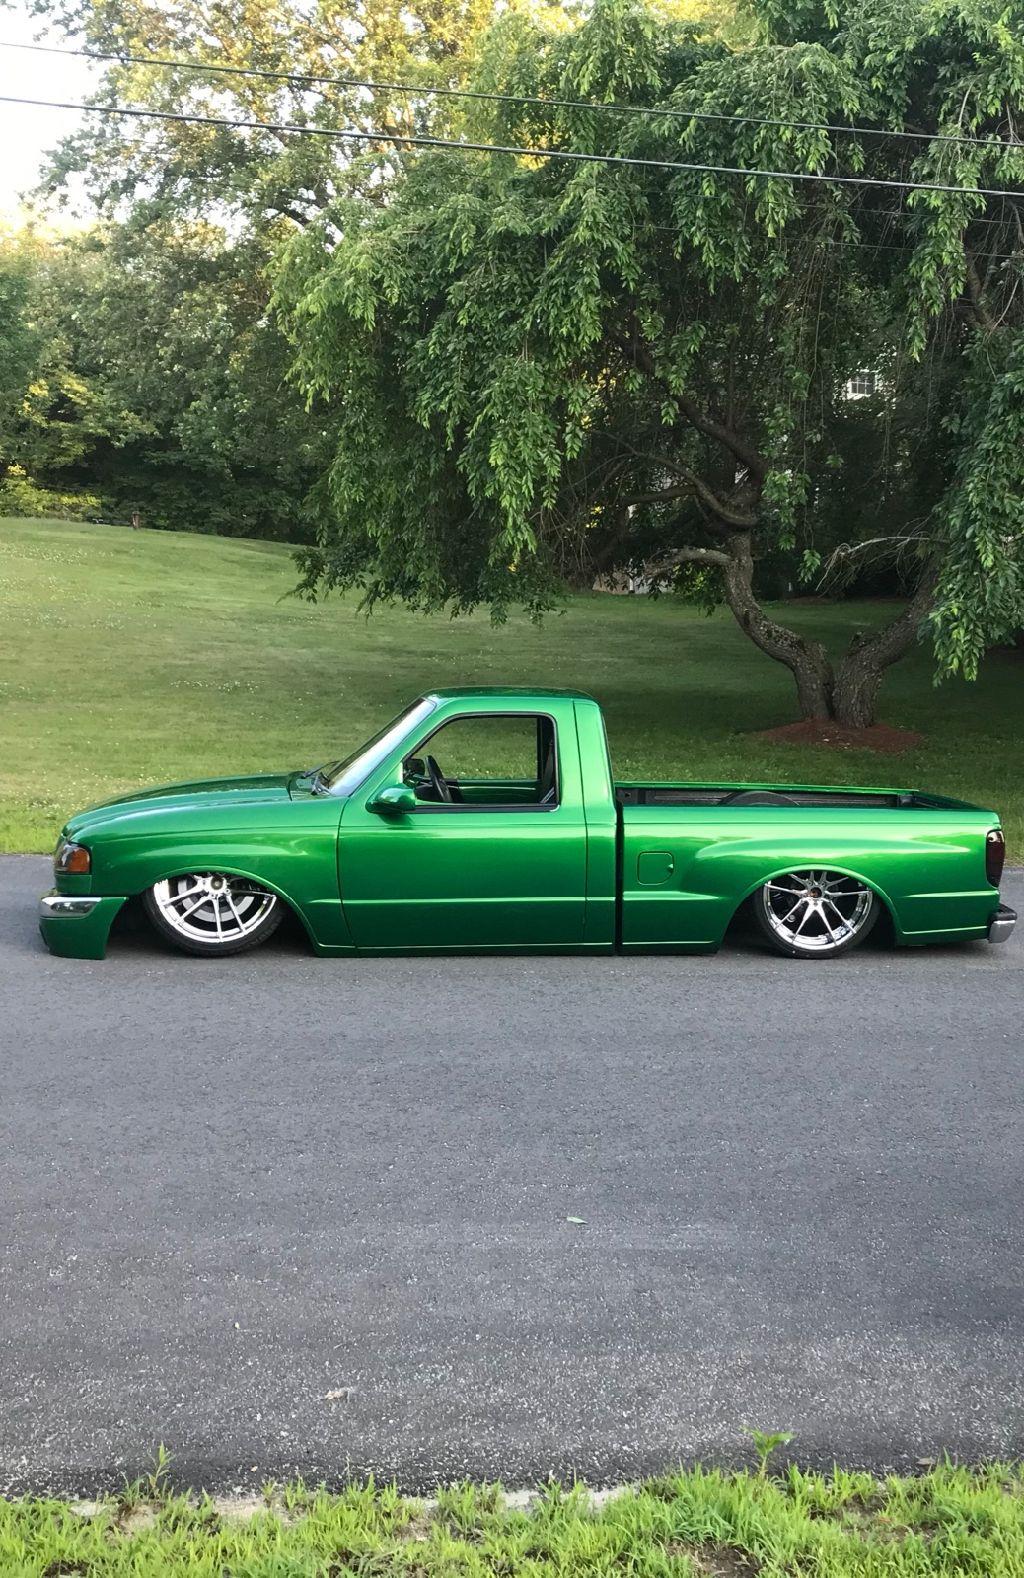 Bagged Trucks For Sale On Craigslist : bagged, trucks, craigslist, Bagged, Bodied, Mazda, B2500, Claz.org